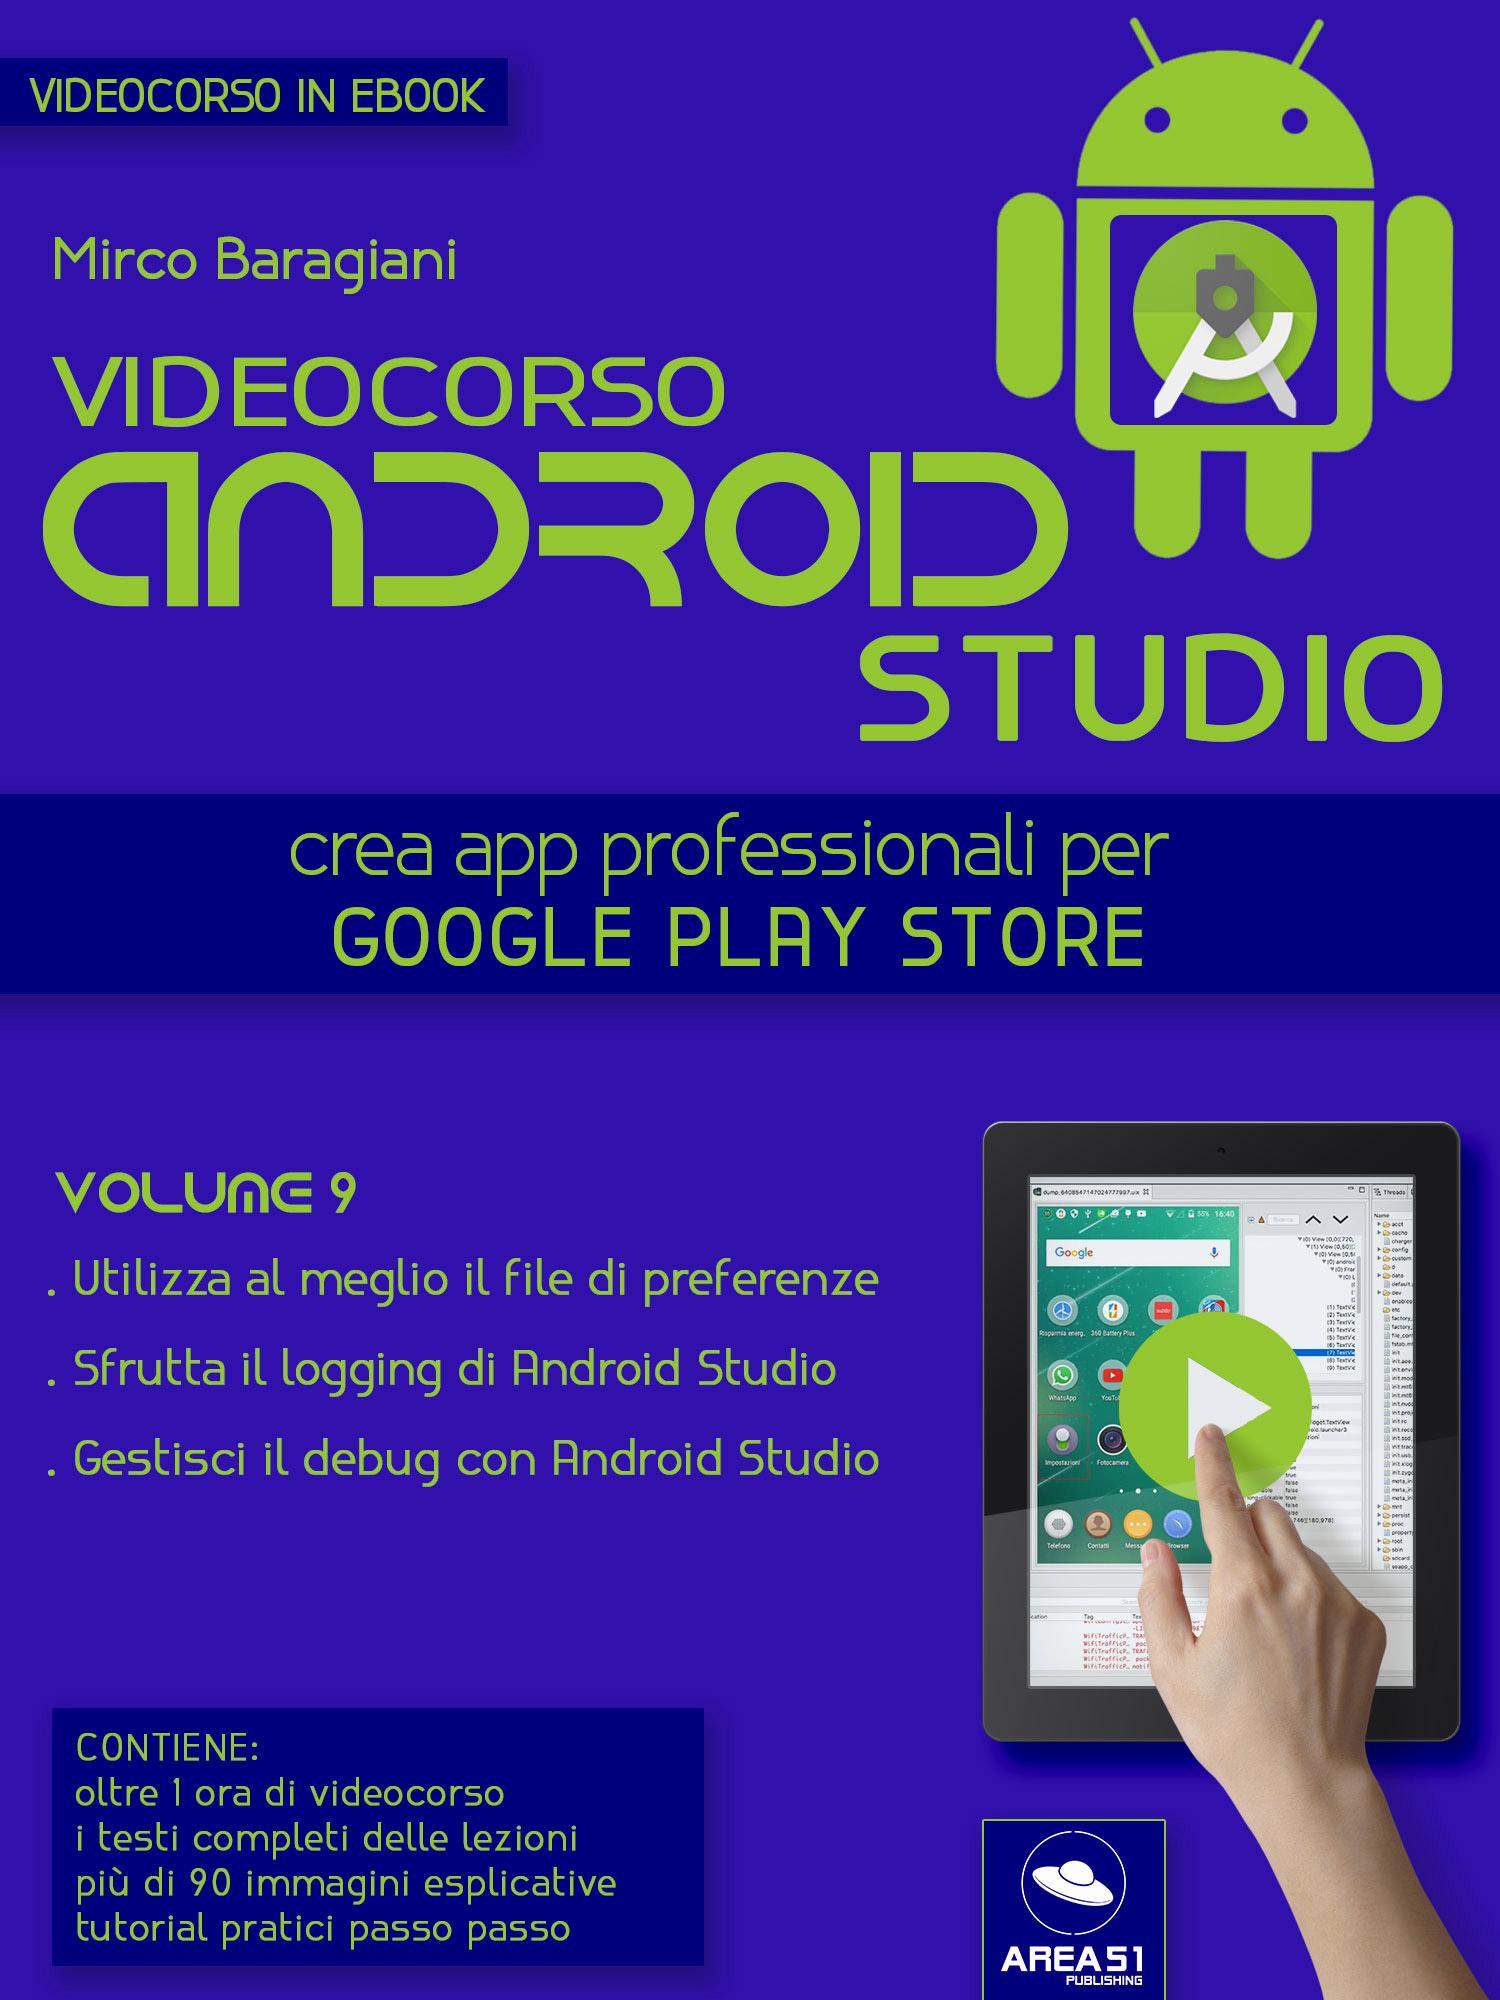 Videocorso Android Studio. Volume 9-0